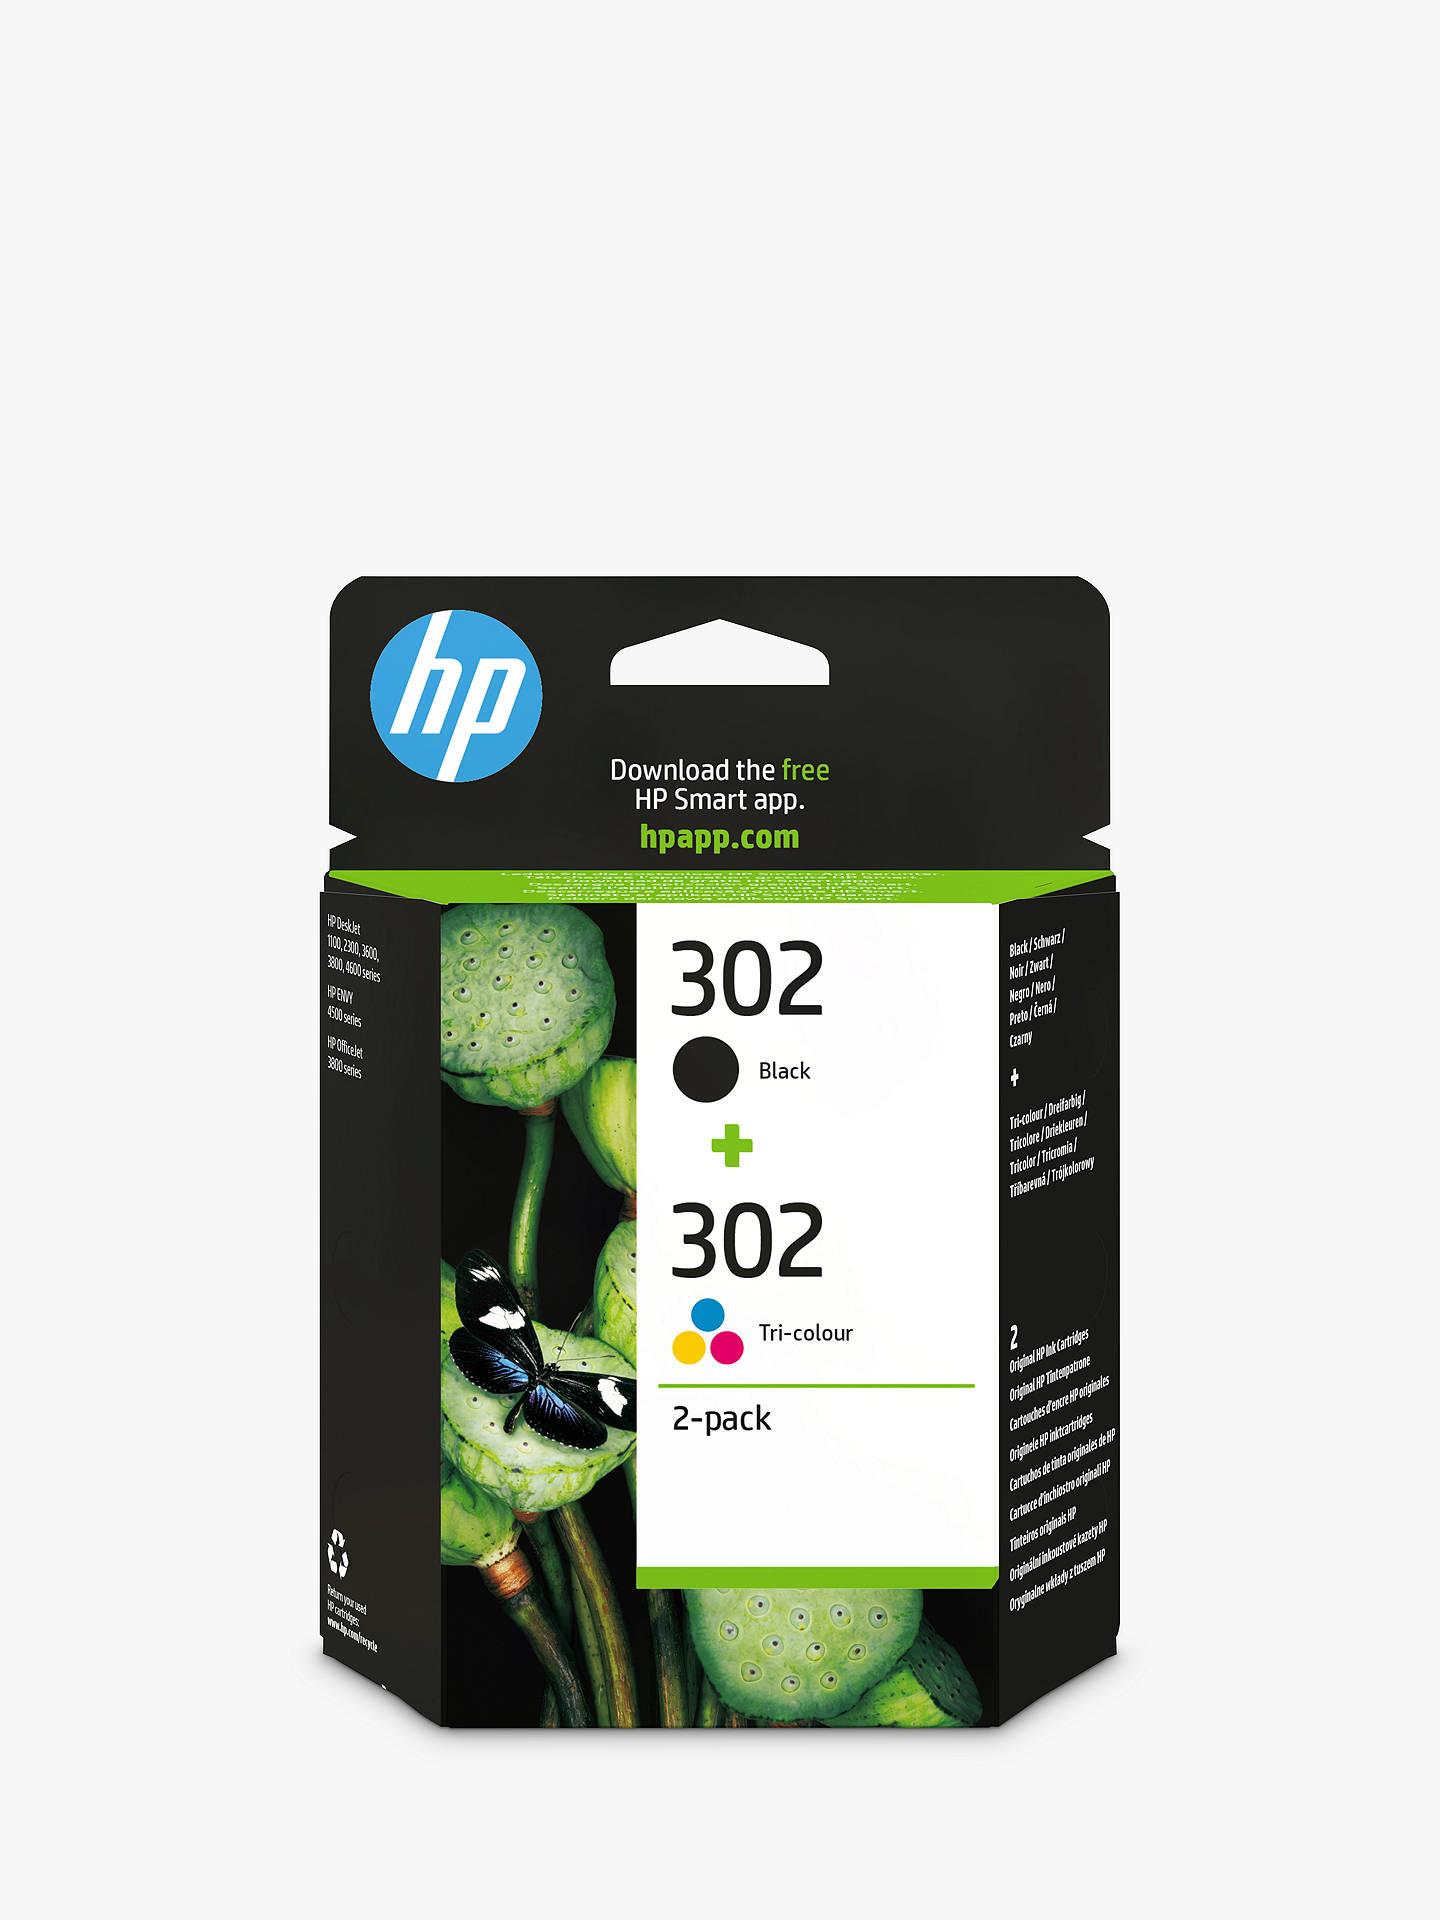 HP 302 Ink Cartridge Black & Tri-Colour Multipack, Pack Of 2